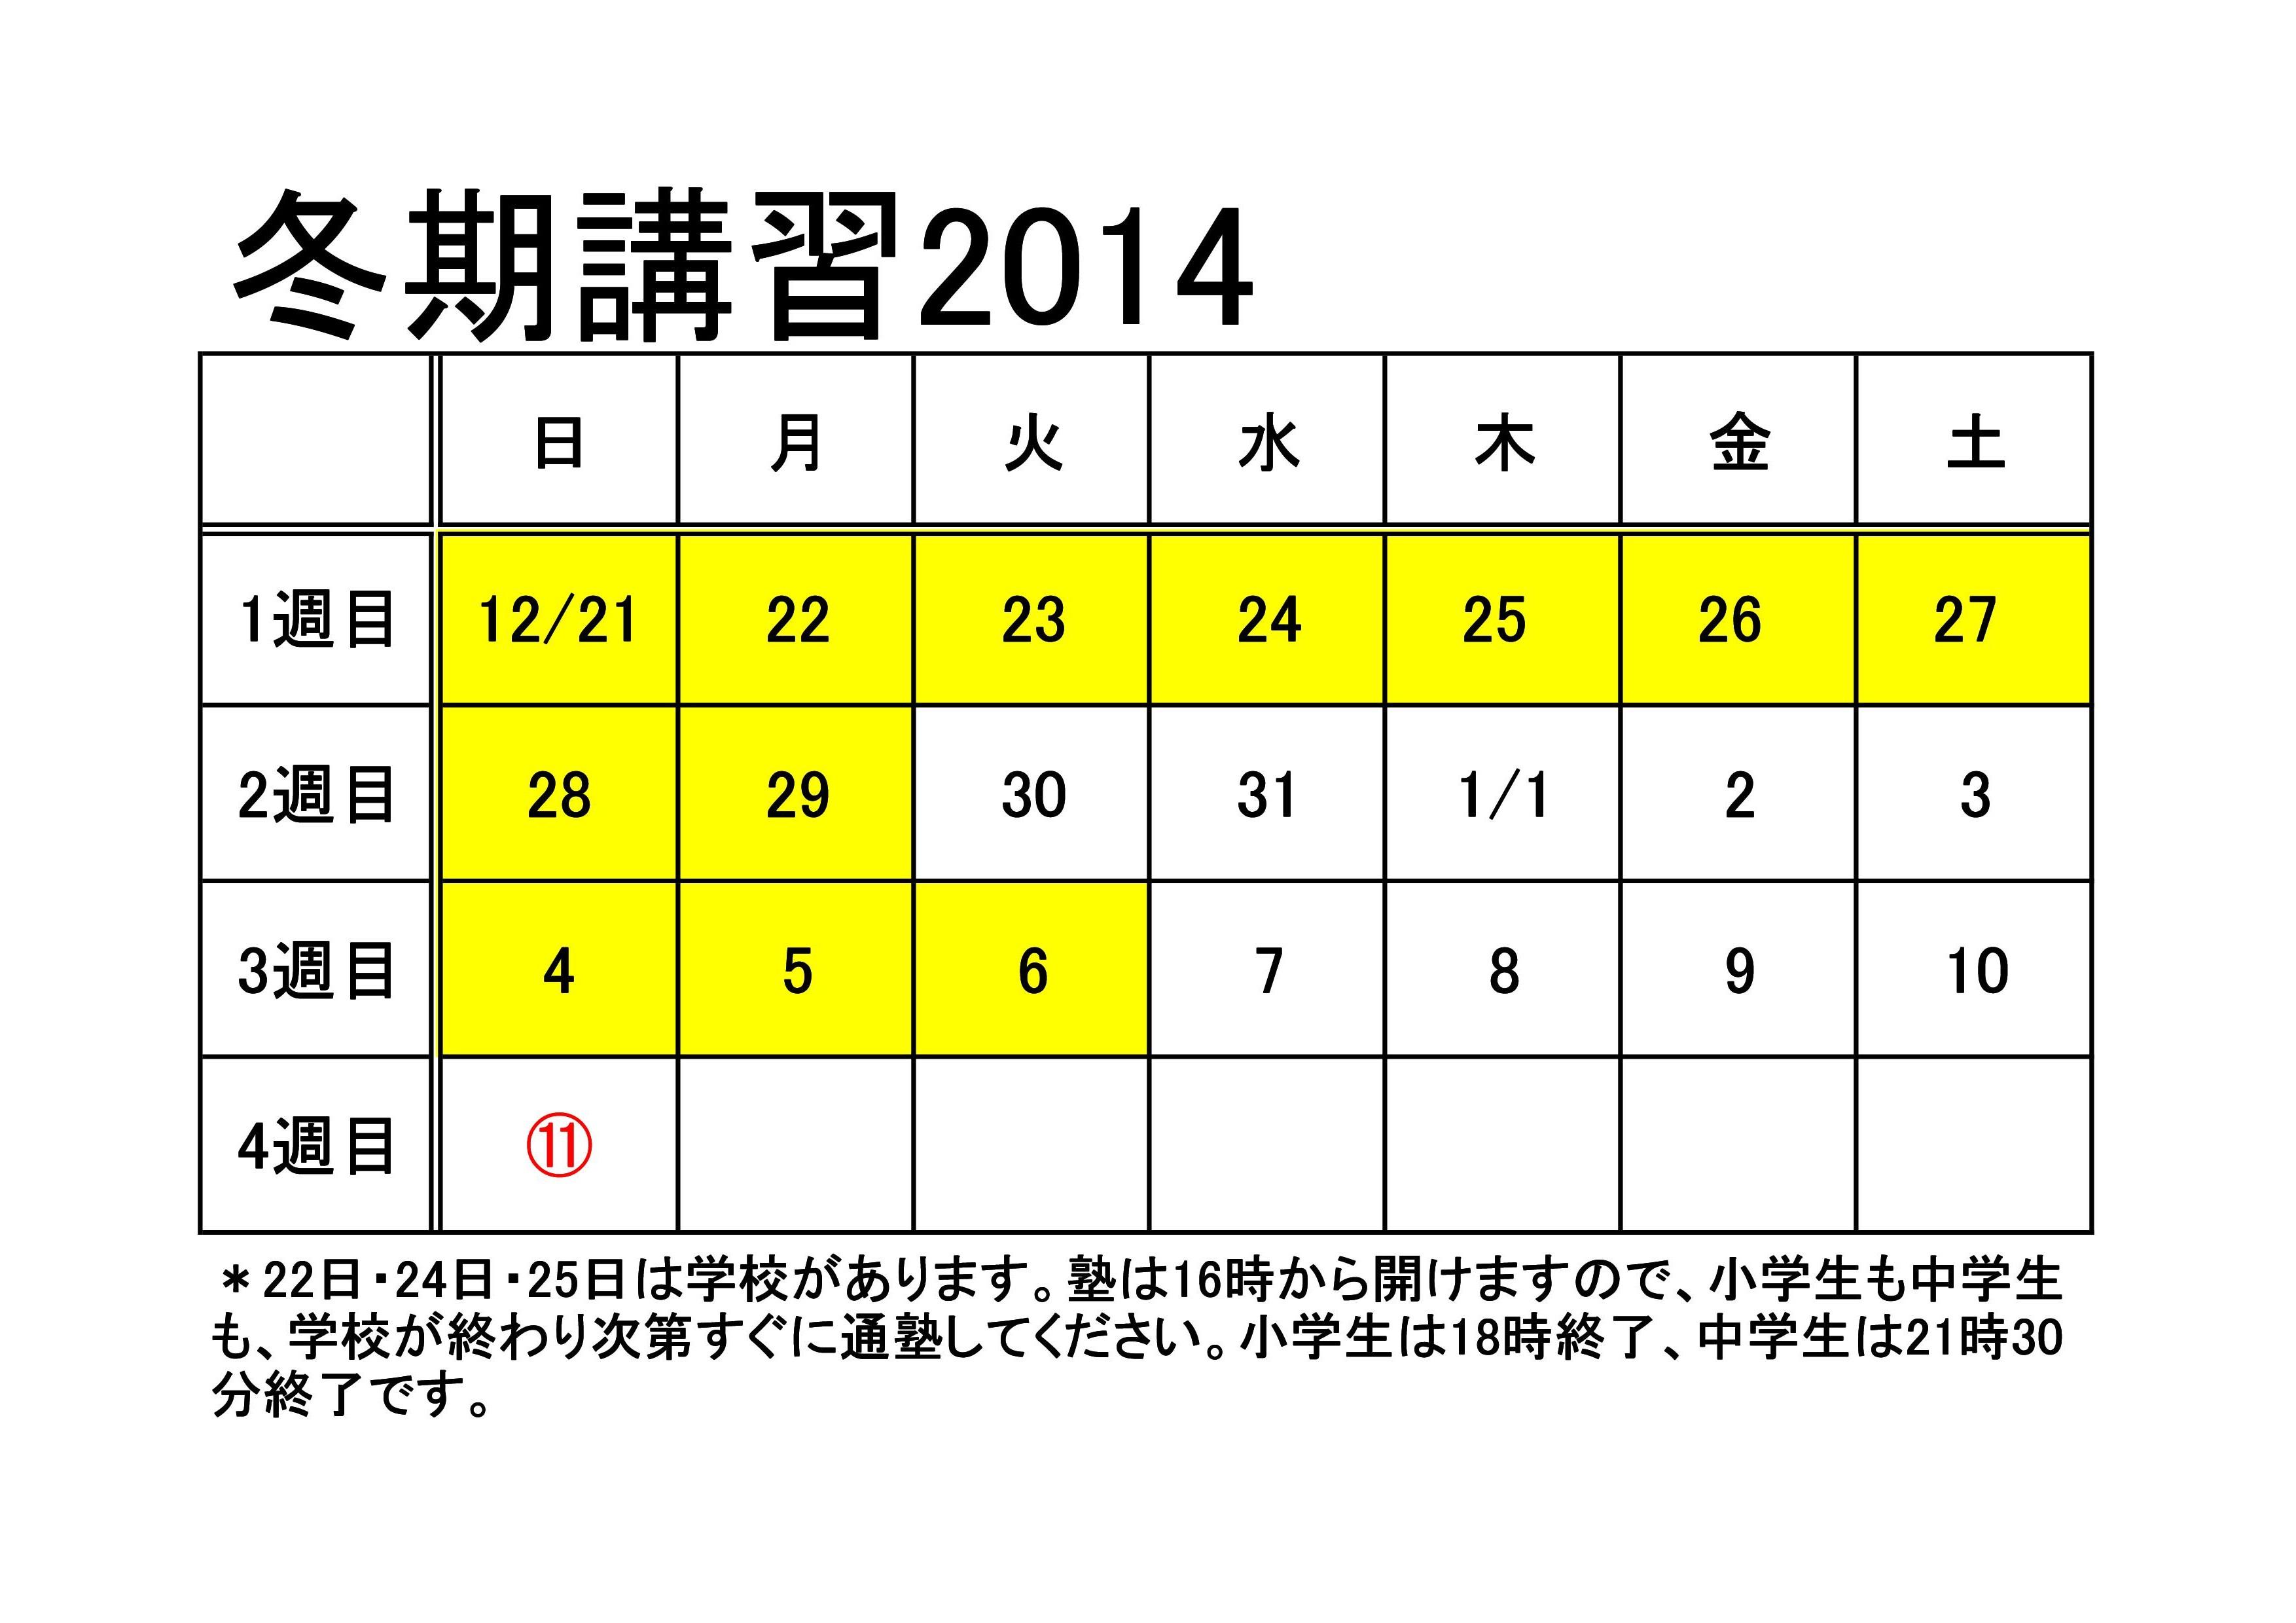 冬期講習時間割HP用2014